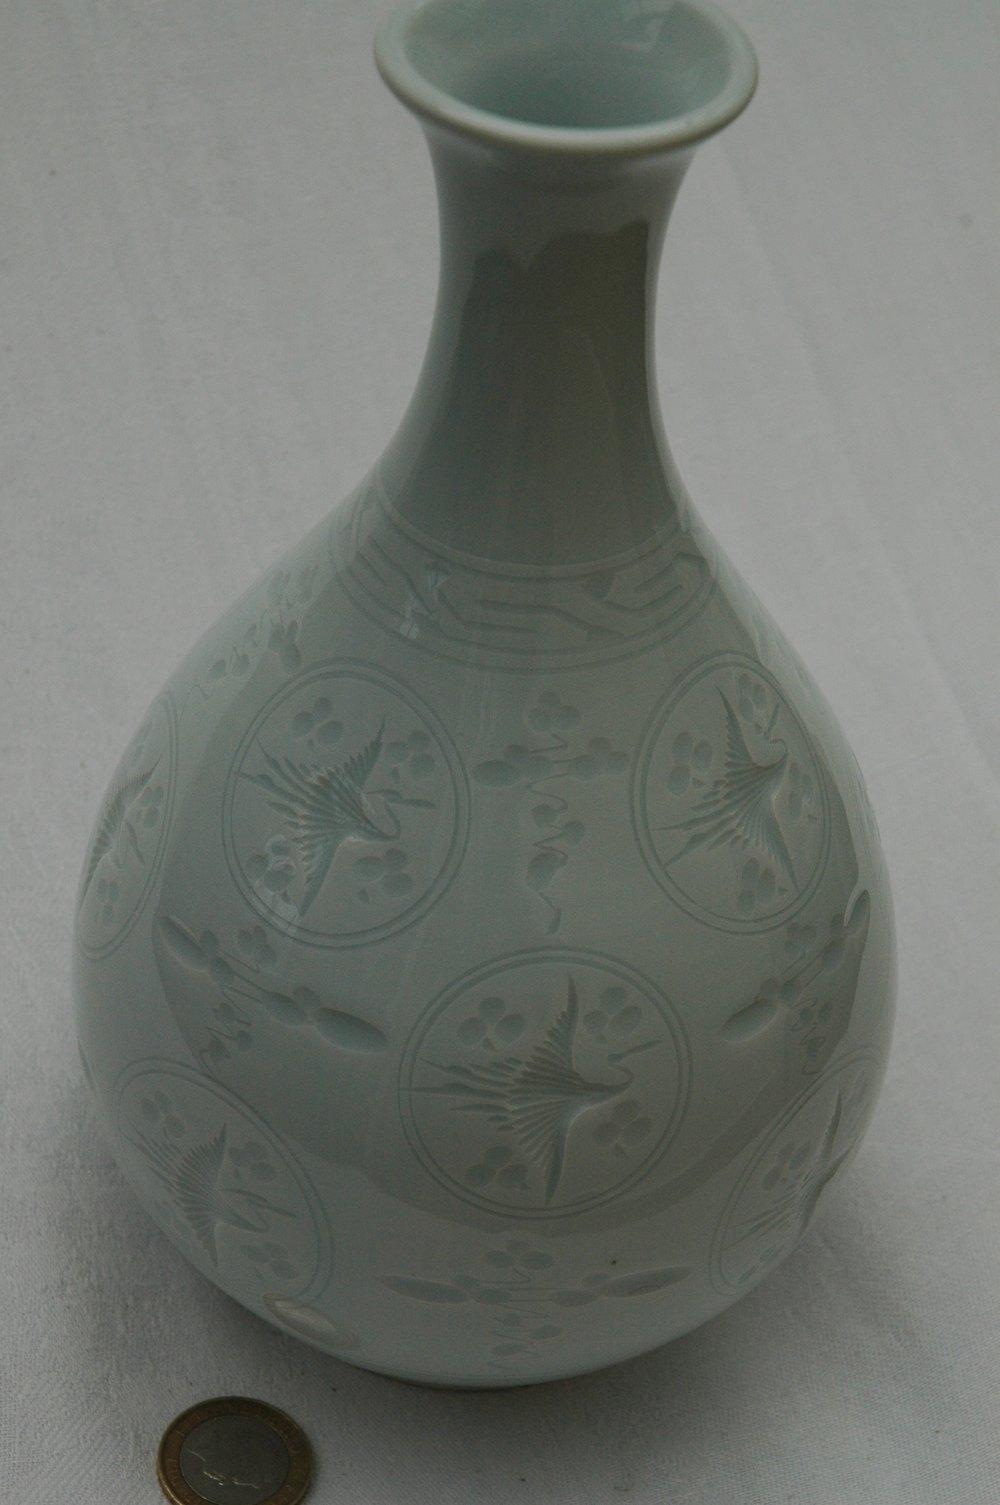 Antiques Atlas - A Very Fine Quality Japanese Celadon Vase.